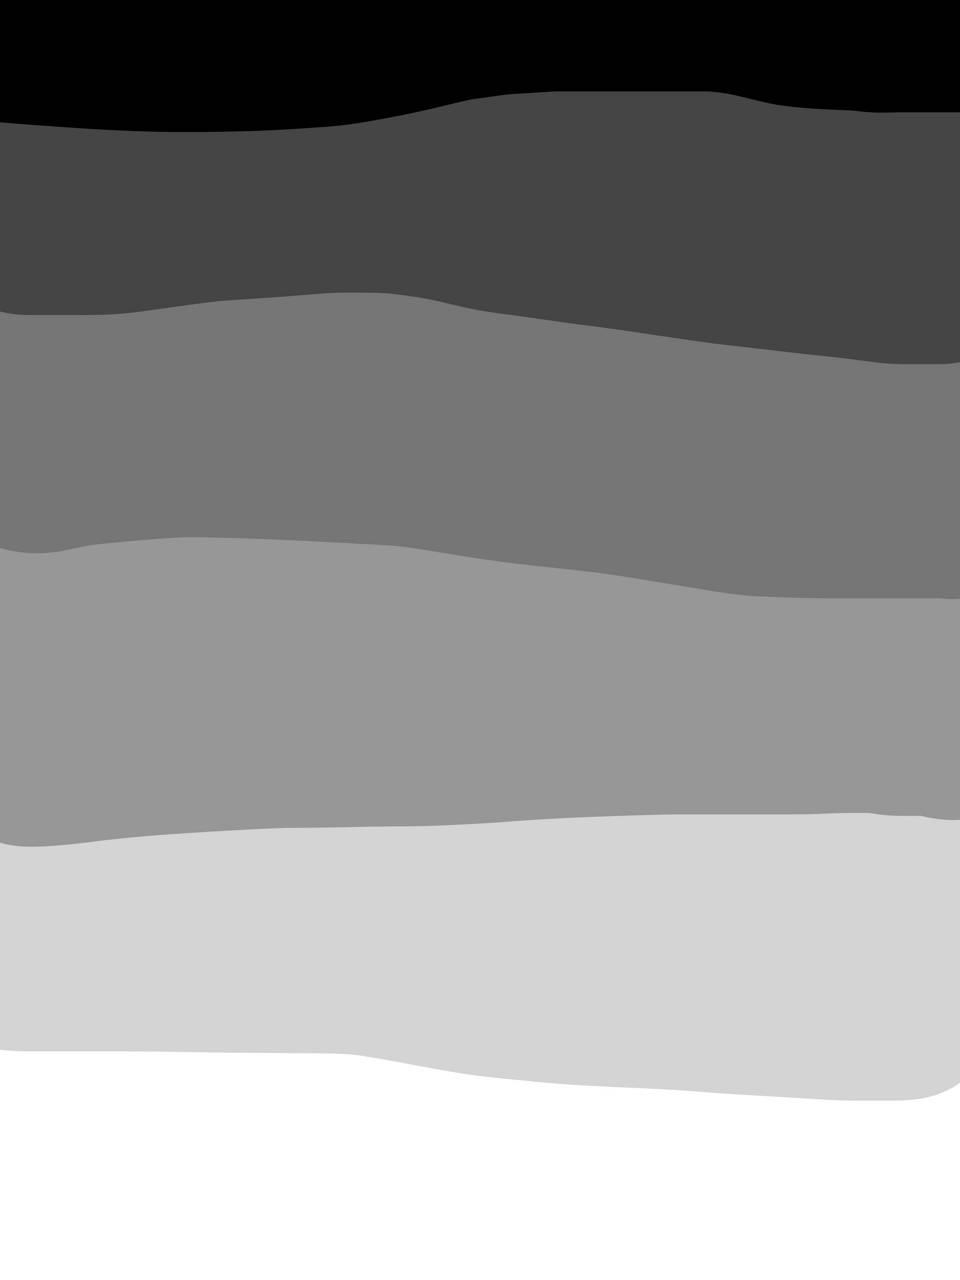 50 Shades Of Grey Wallpaper By Casperzwaard100 29 Free On Zedge